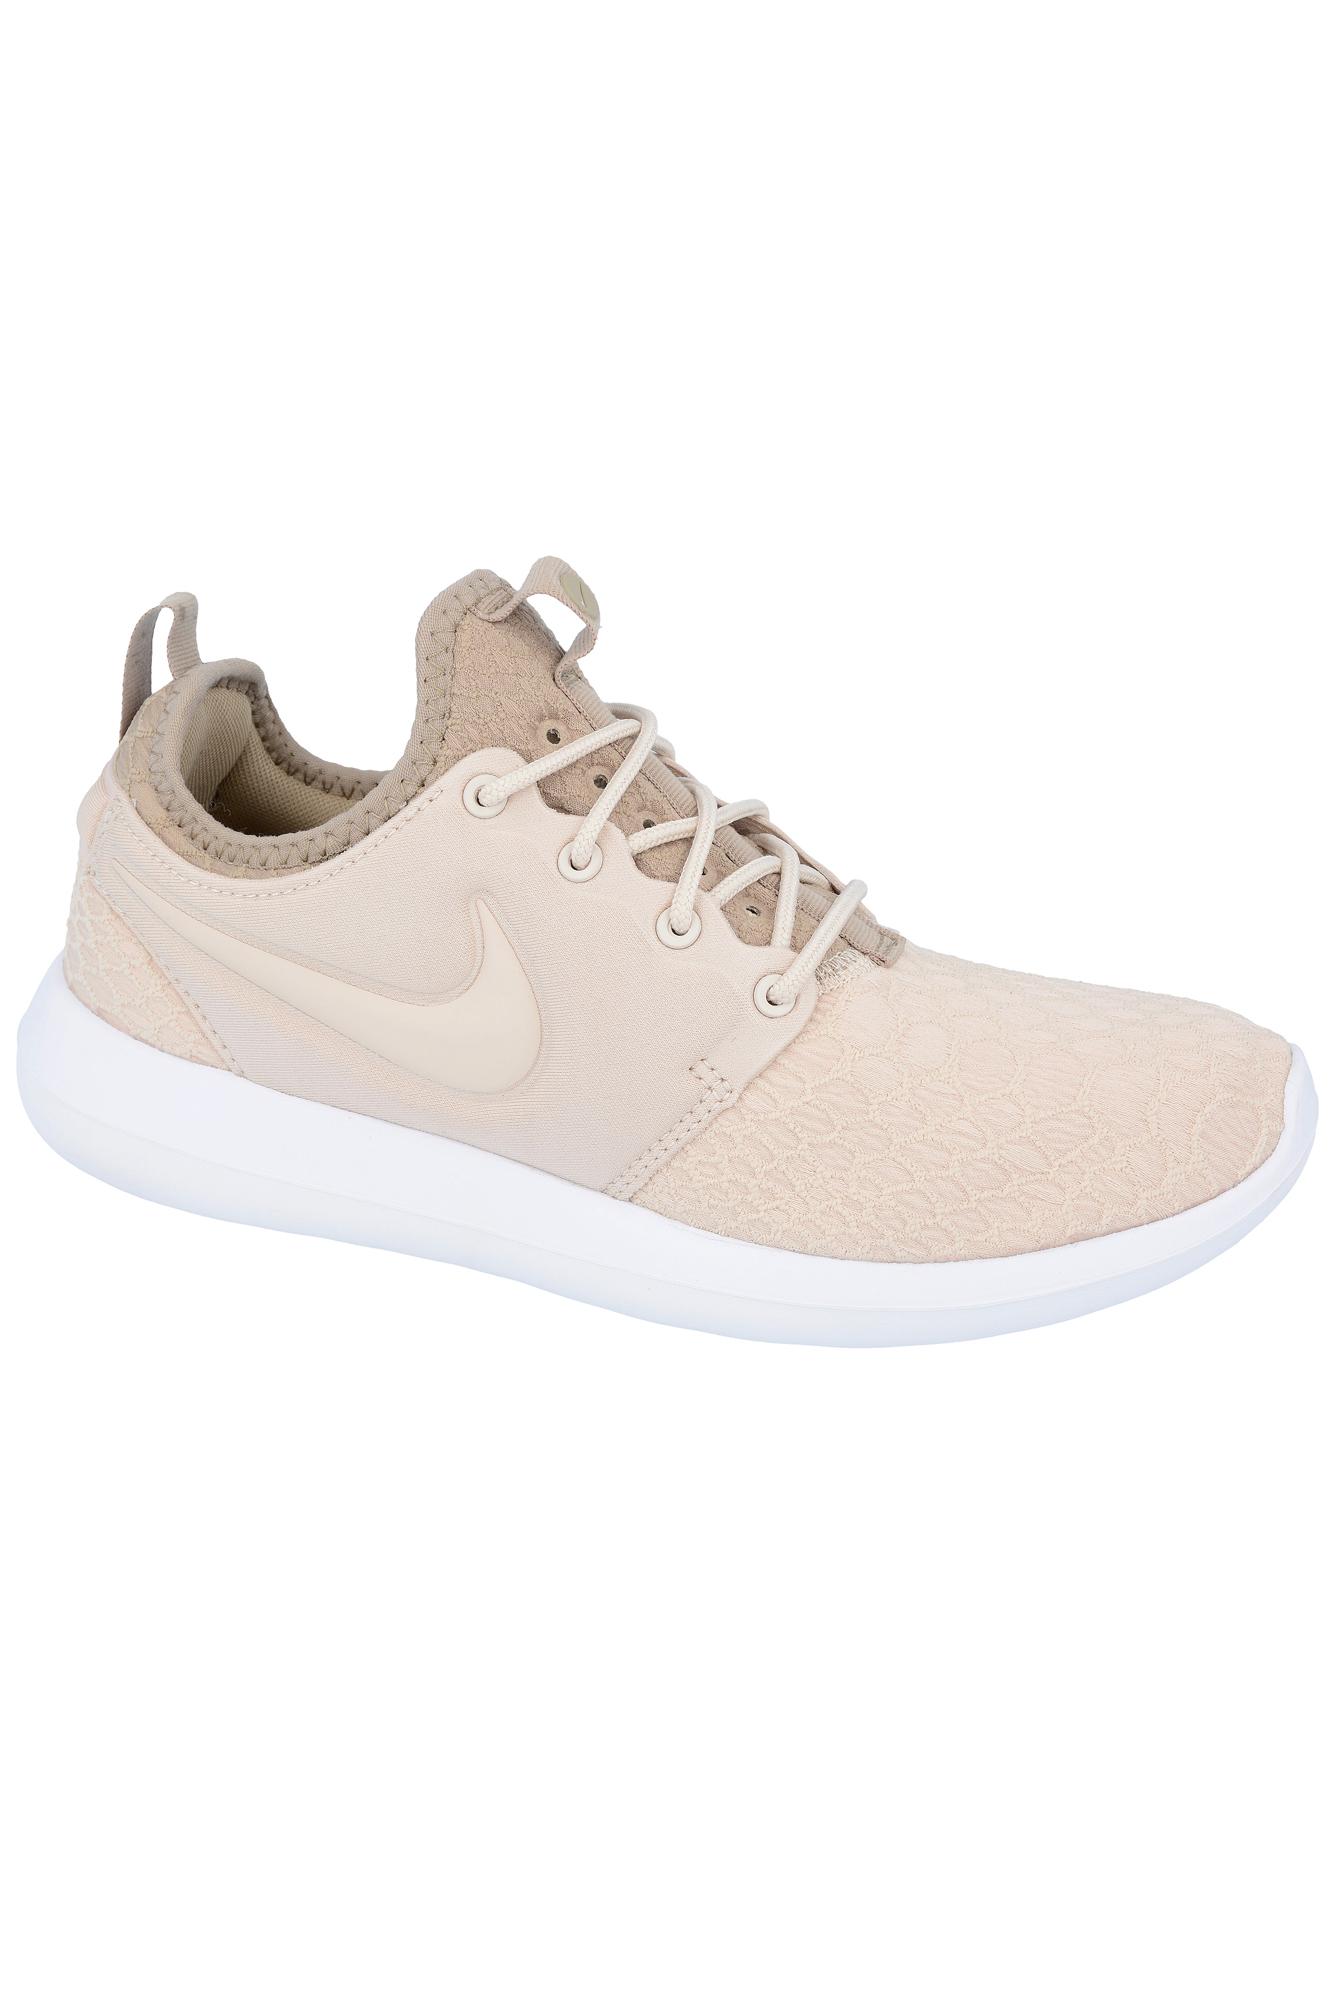 online retailer 713e8 9a297 Buty Nike Roshe Two SE - 881188-100 / Na co dzień / Buty / Damskie ...